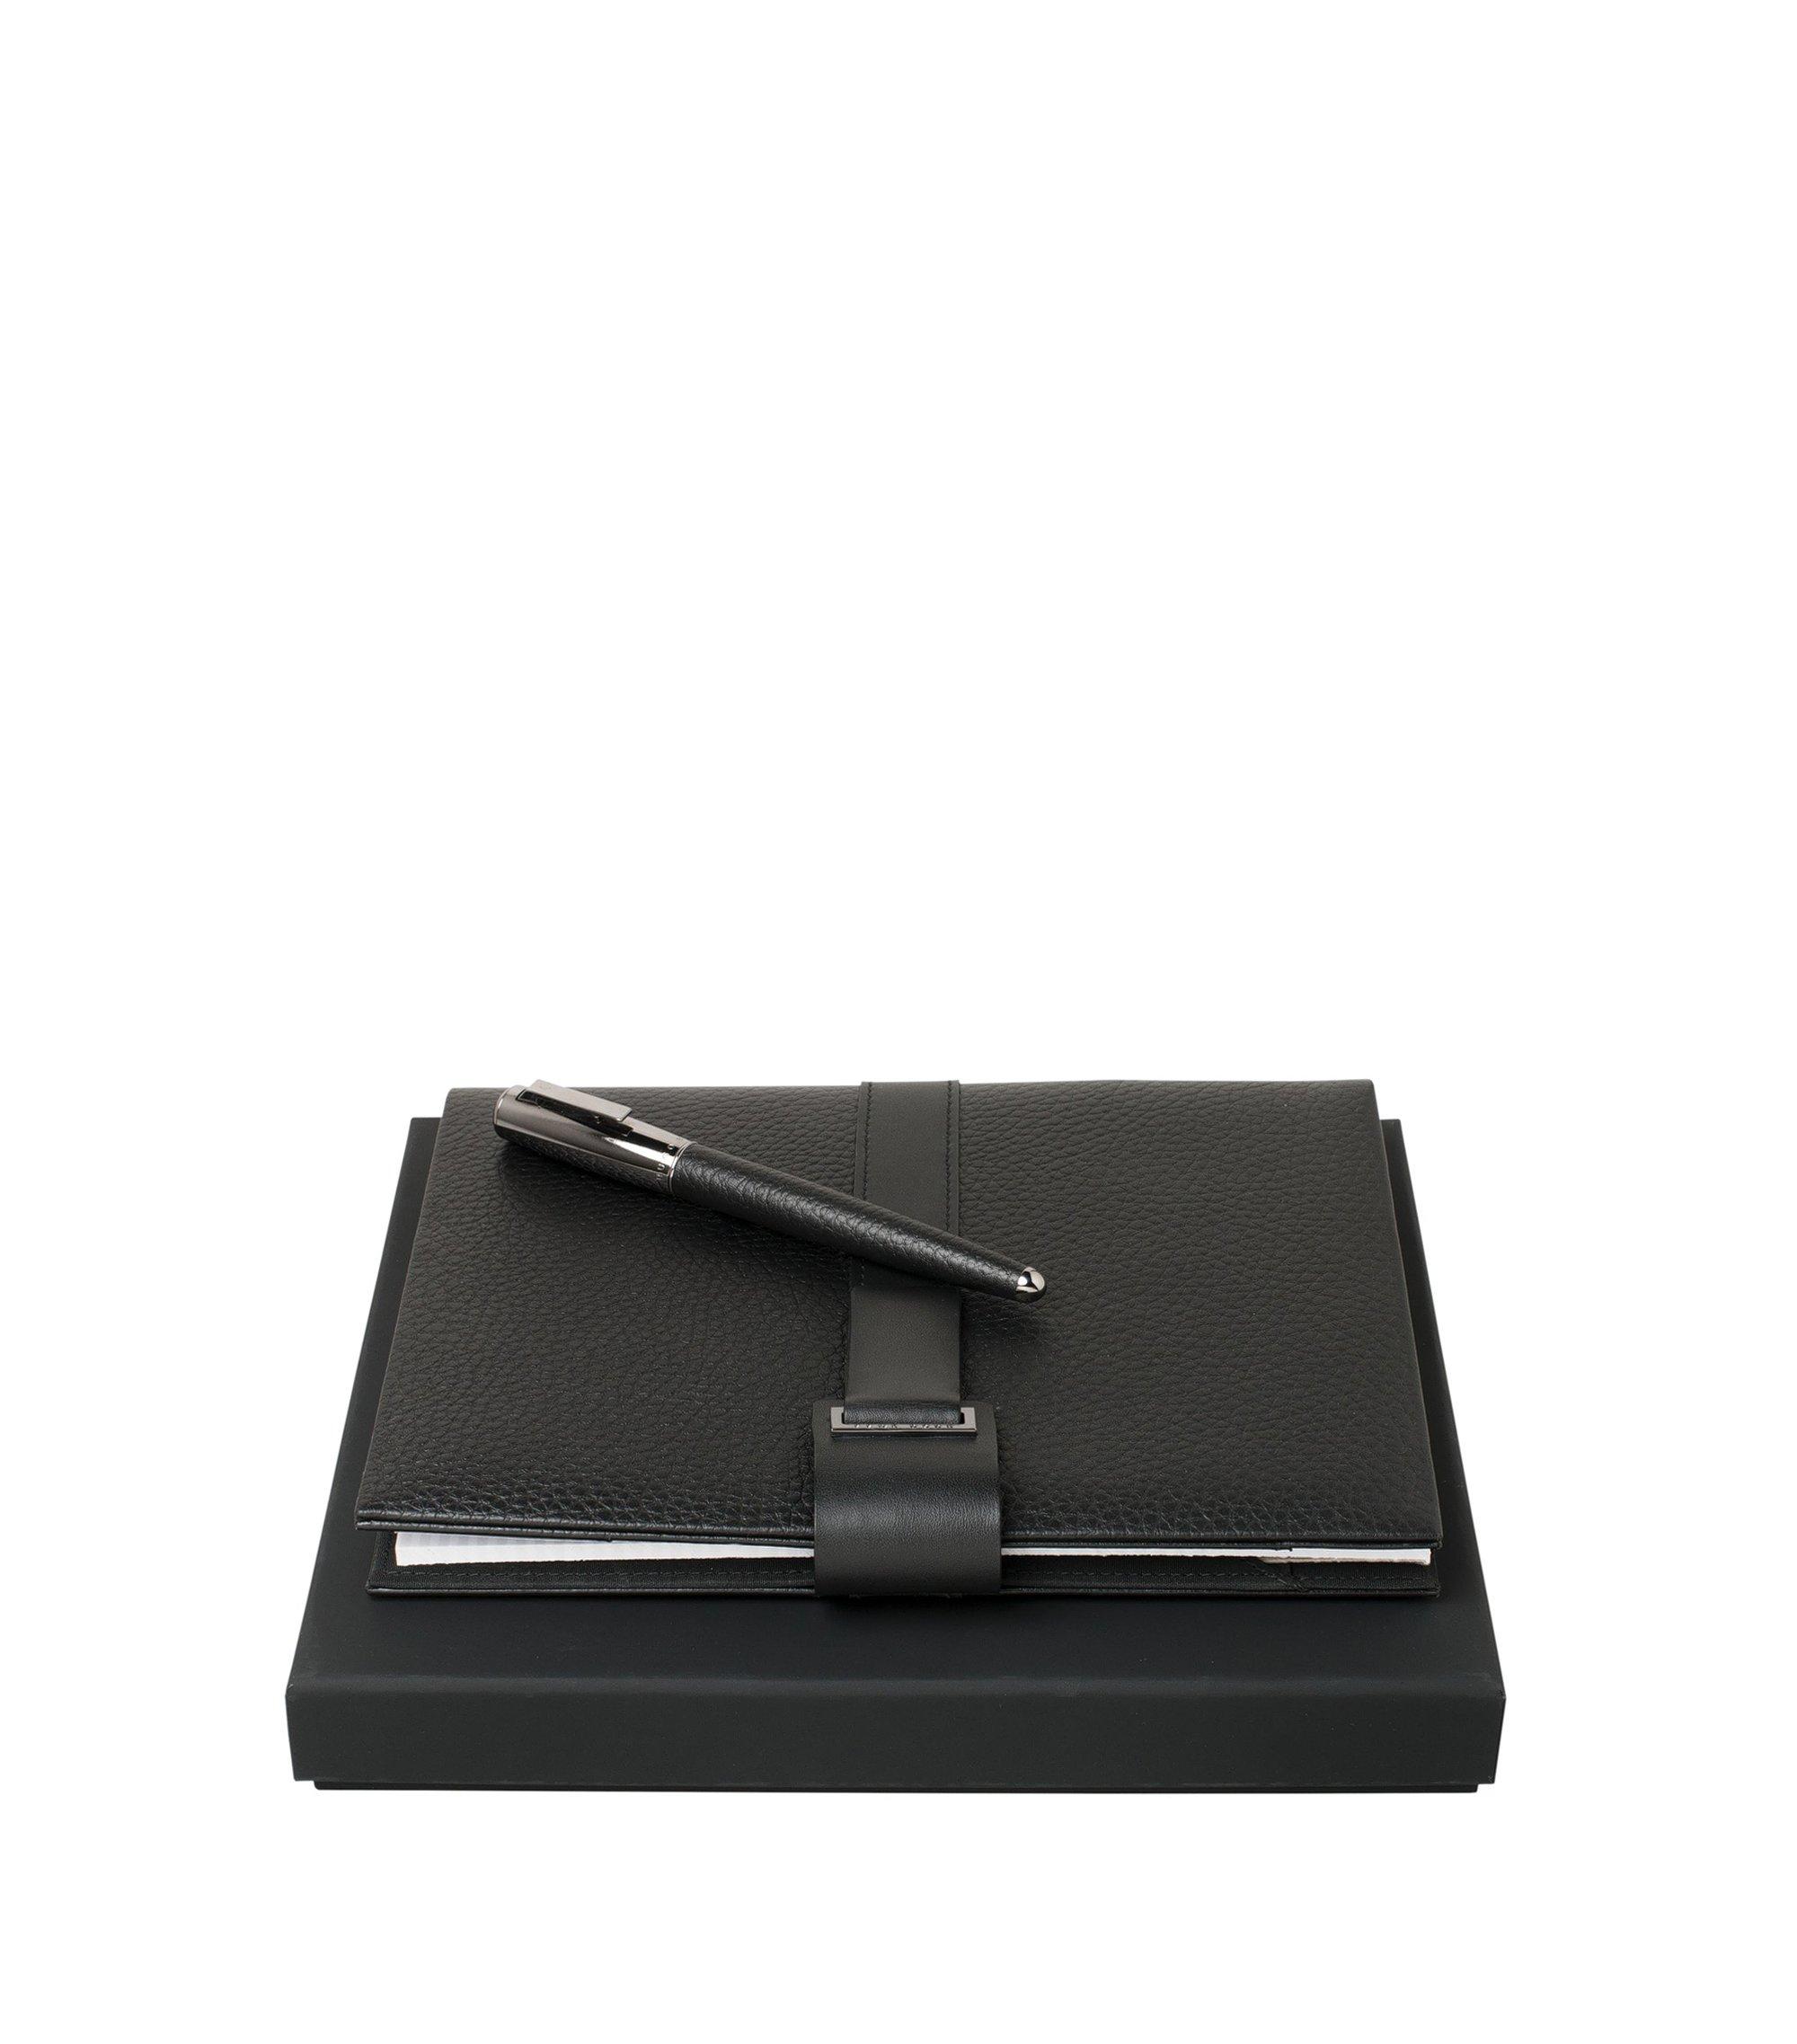 Pure Rollerball Pen & Folder Set | HPMR604A, Khaki